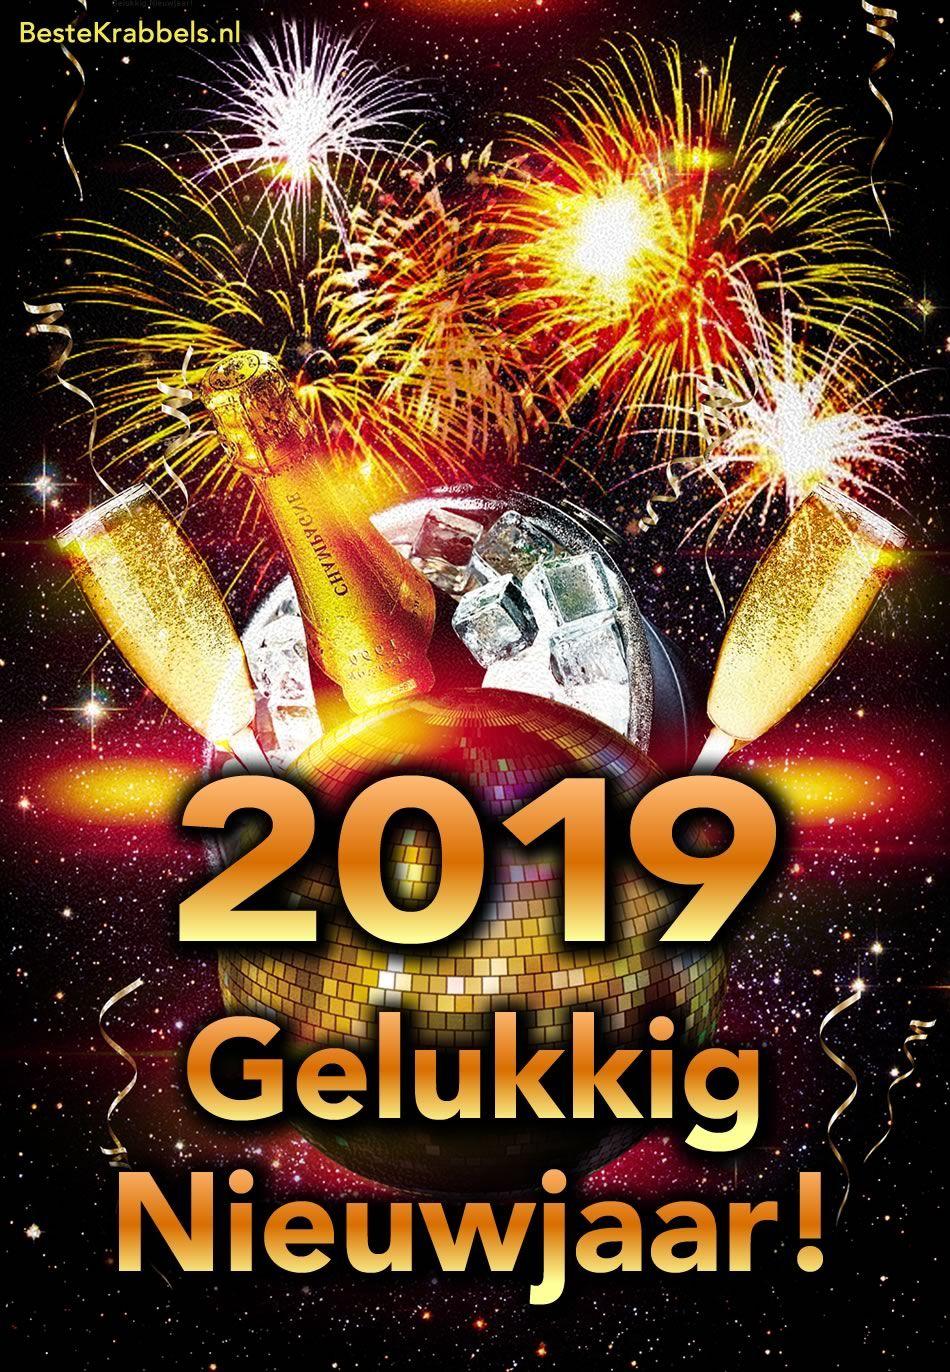 Nieuwjaar 2019 Plaatje 3 Merry X Mas N Happy Nu Year Gelukkig